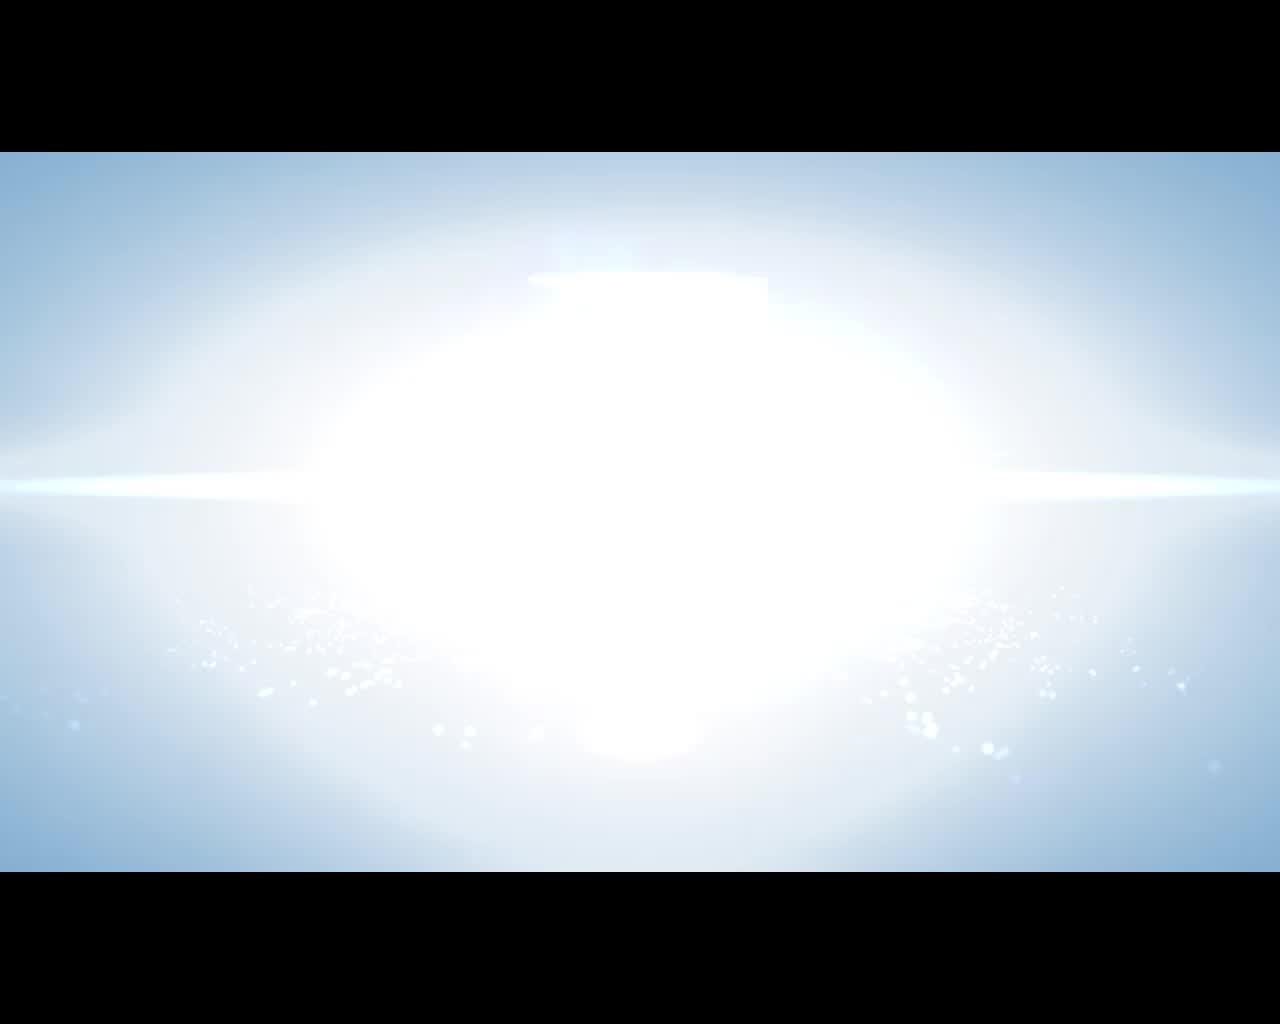 Hohe Effizienz 250 260 270 Watt Solarpanel Preis, Photovoltaik Solar-Panel